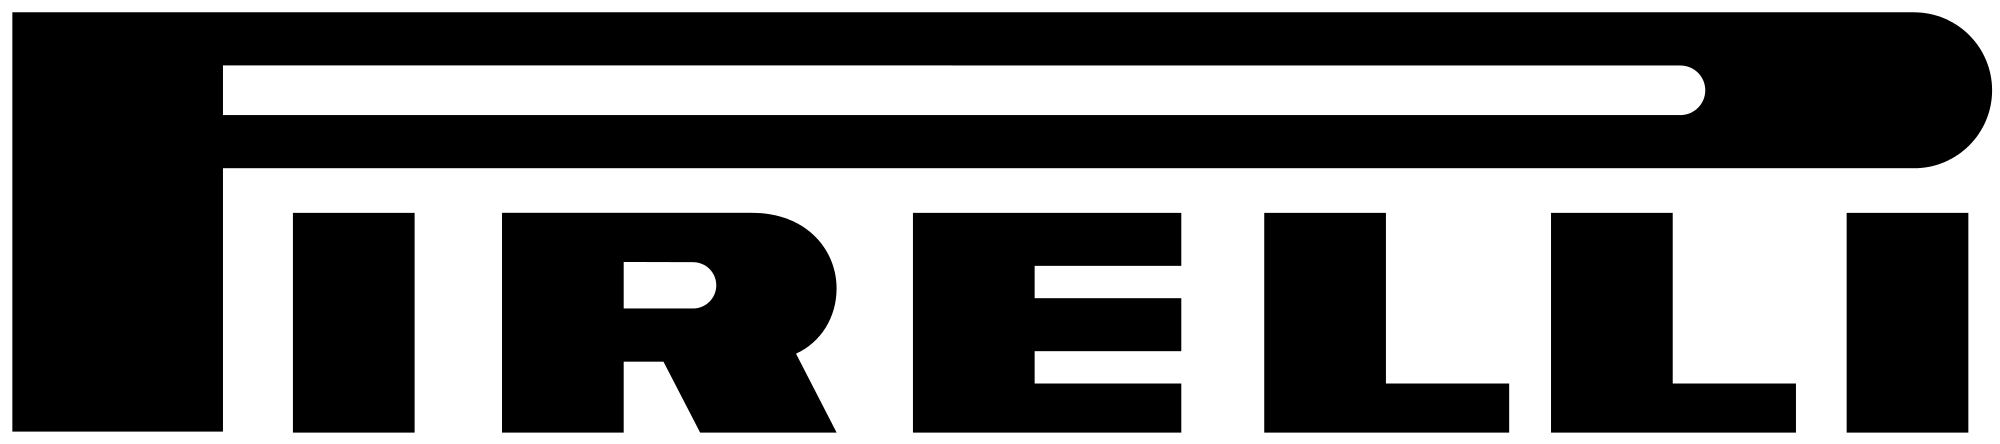 Pirelli Logo transparent PNG.